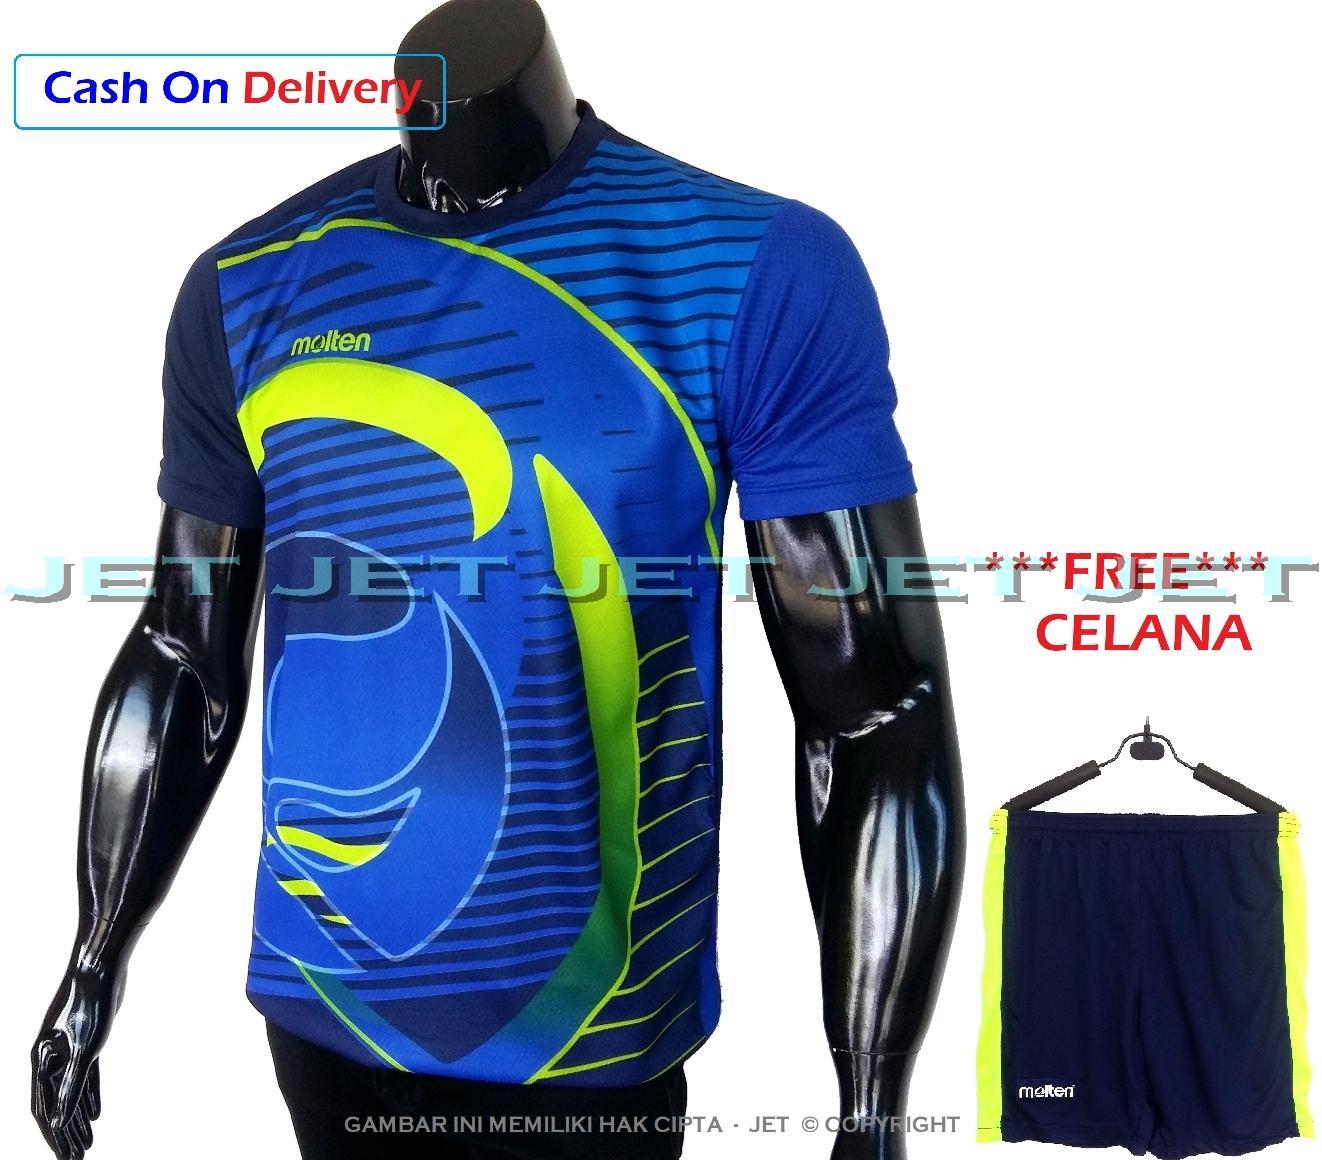 Pakaian Baju Olahraga Pria Paket Celana Sepeda Dan Jersey Downhill Cross Premium Jet Sports Stelan Kaos M L Xl Dri Fit Sport Replica